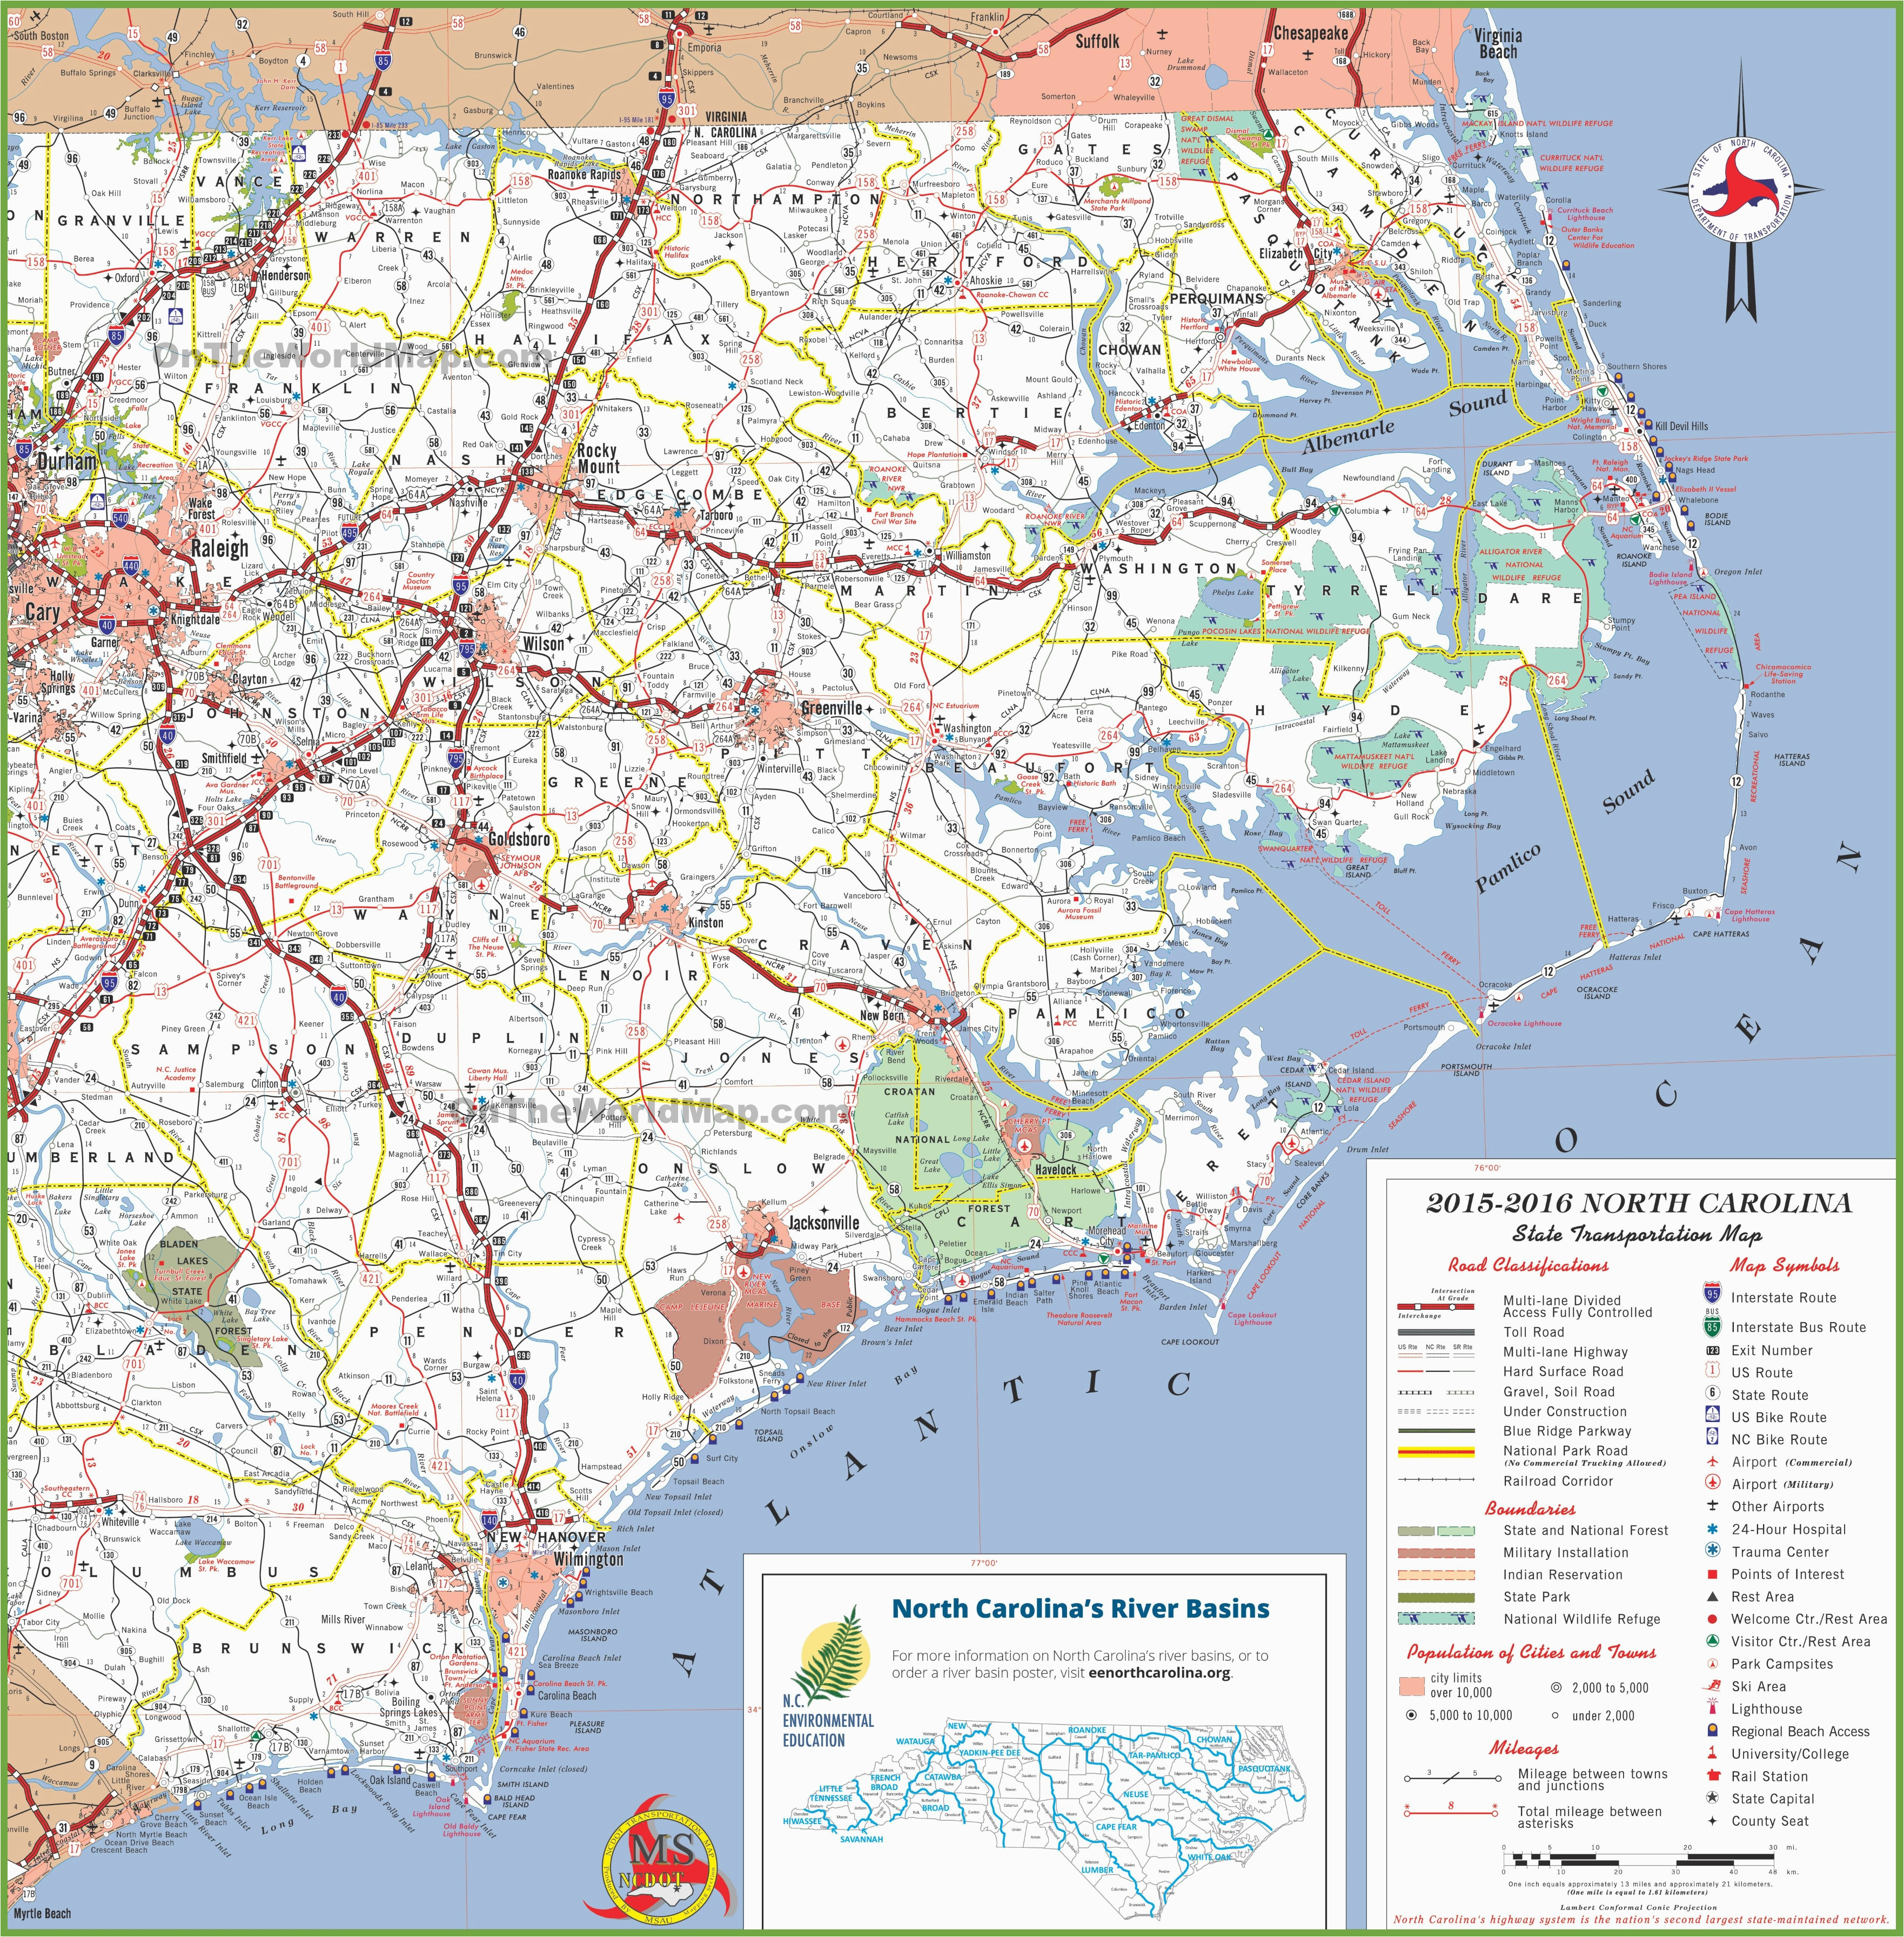 North Carolina Map Of Coast north Carolina State Maps Usa Maps Of north Carolina Nc